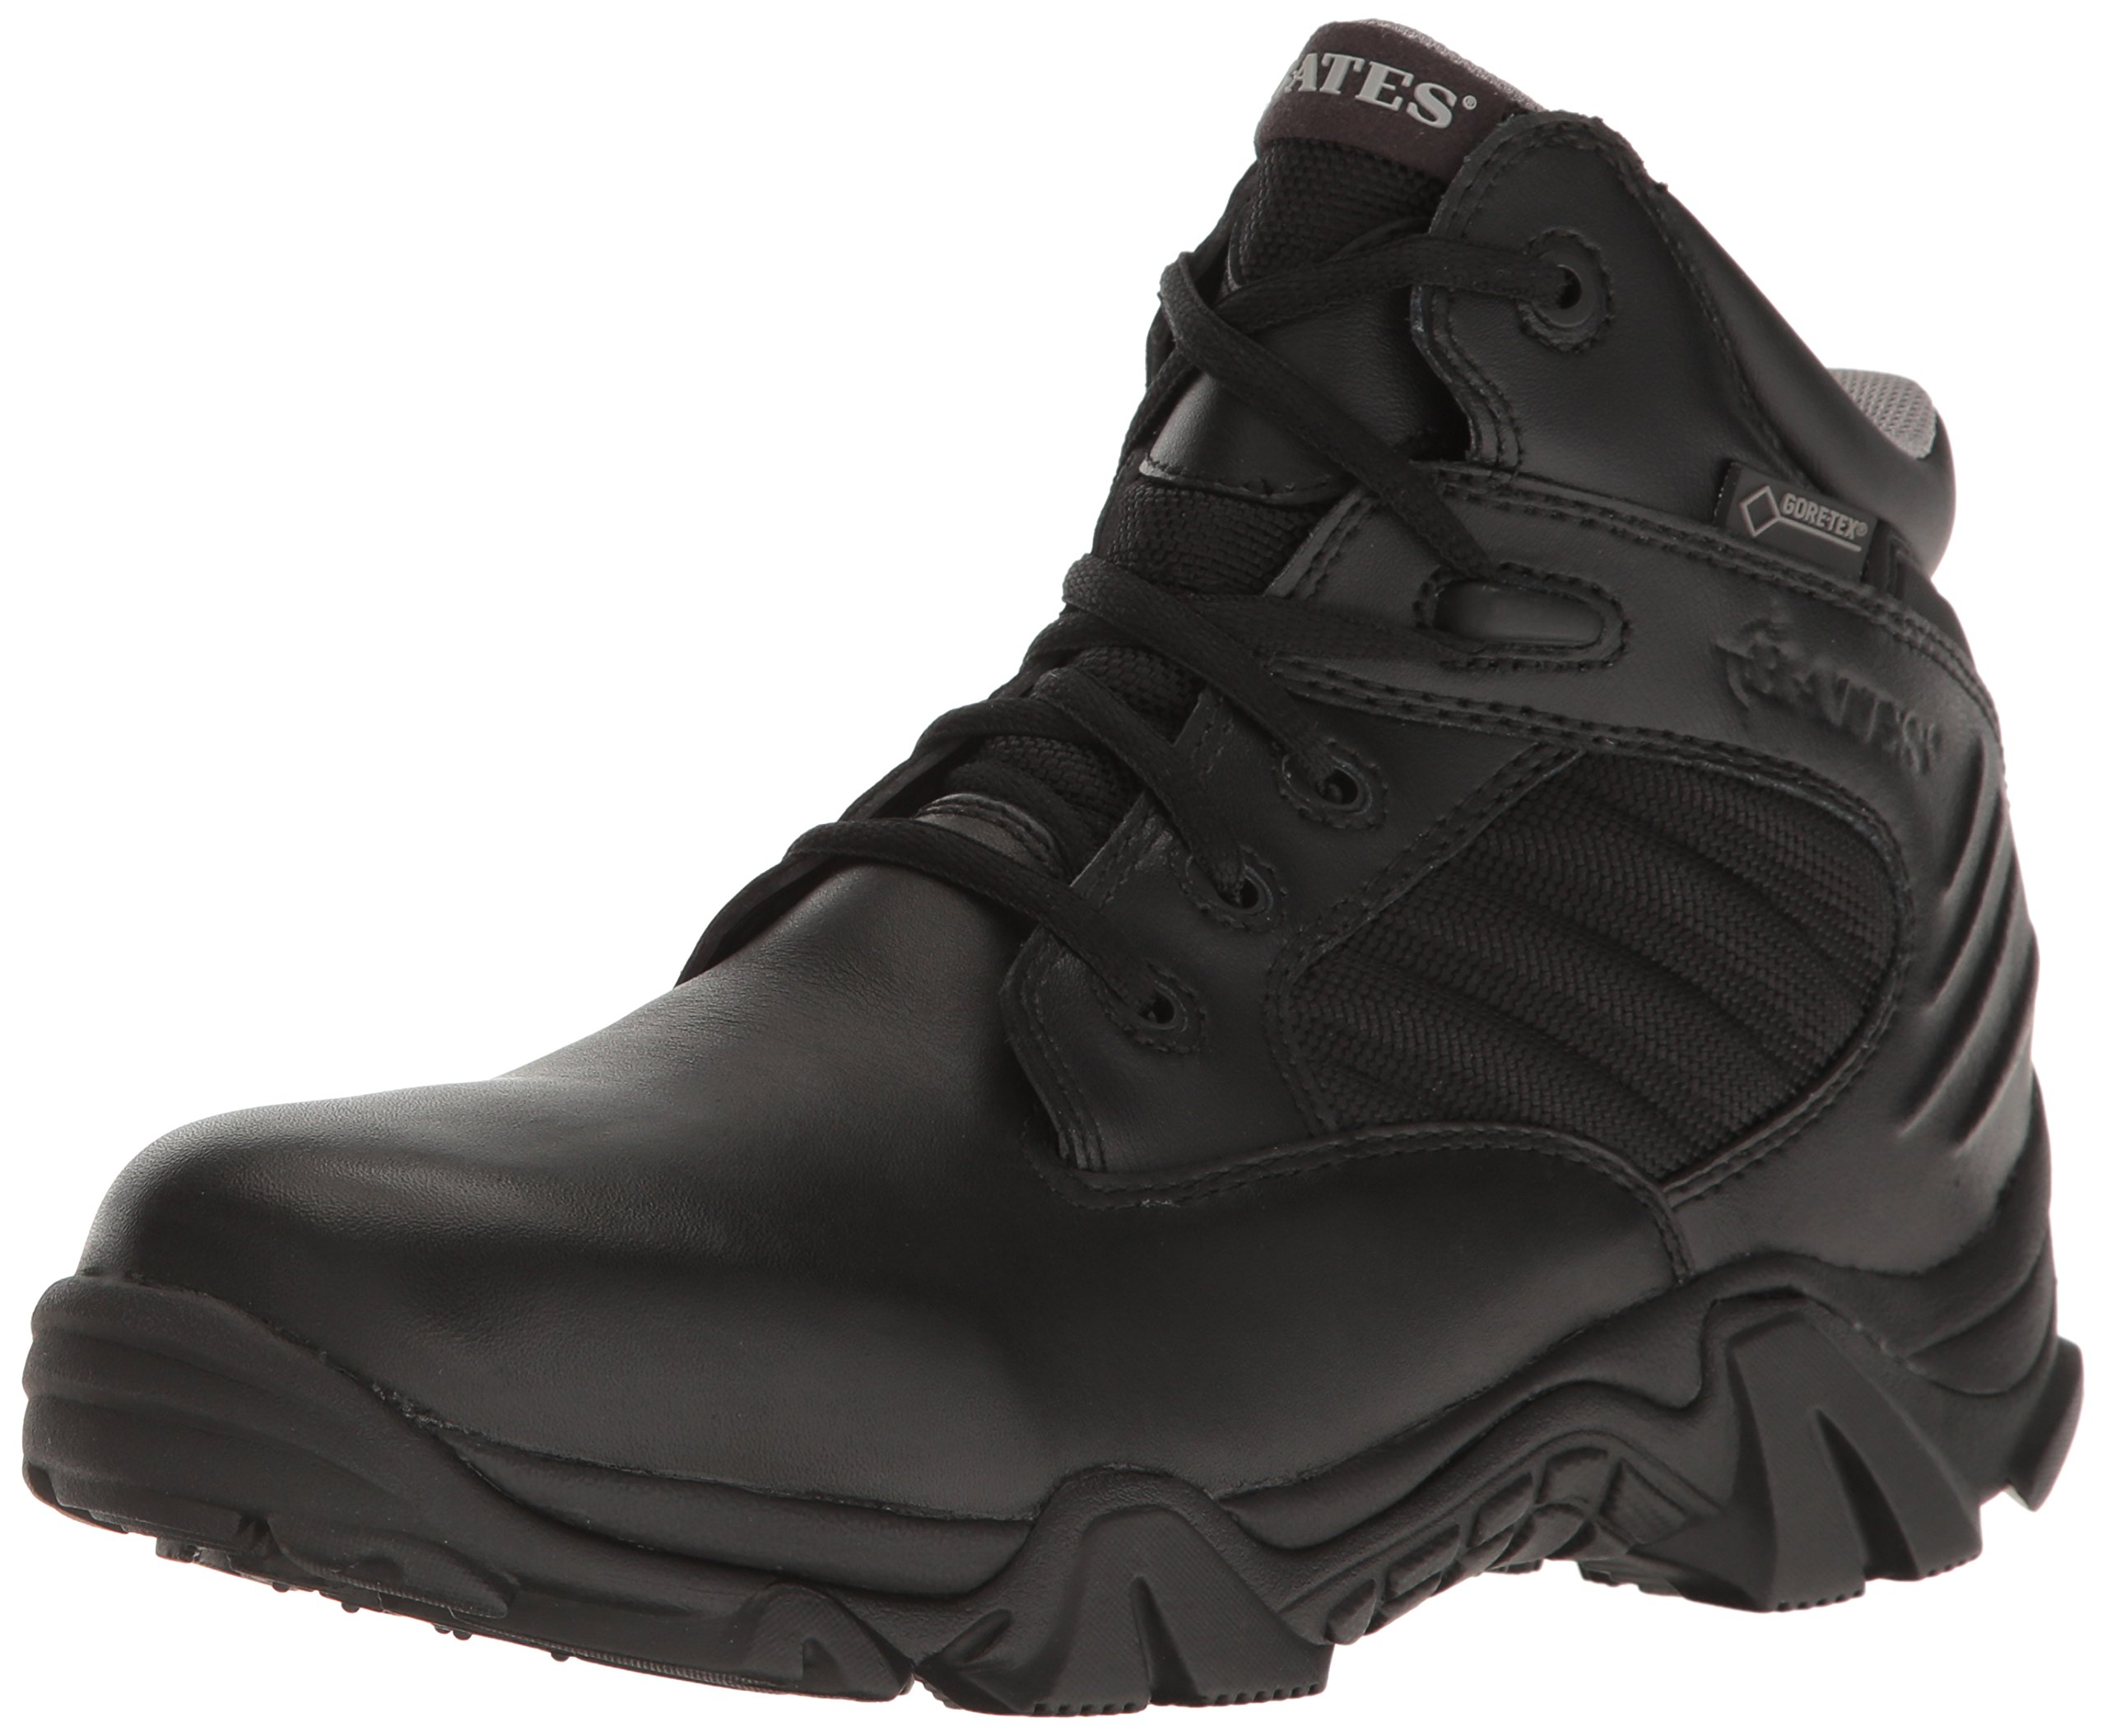 Bates Women's Gx-4 4 Inch Boot, Black, 8 M US by Bates